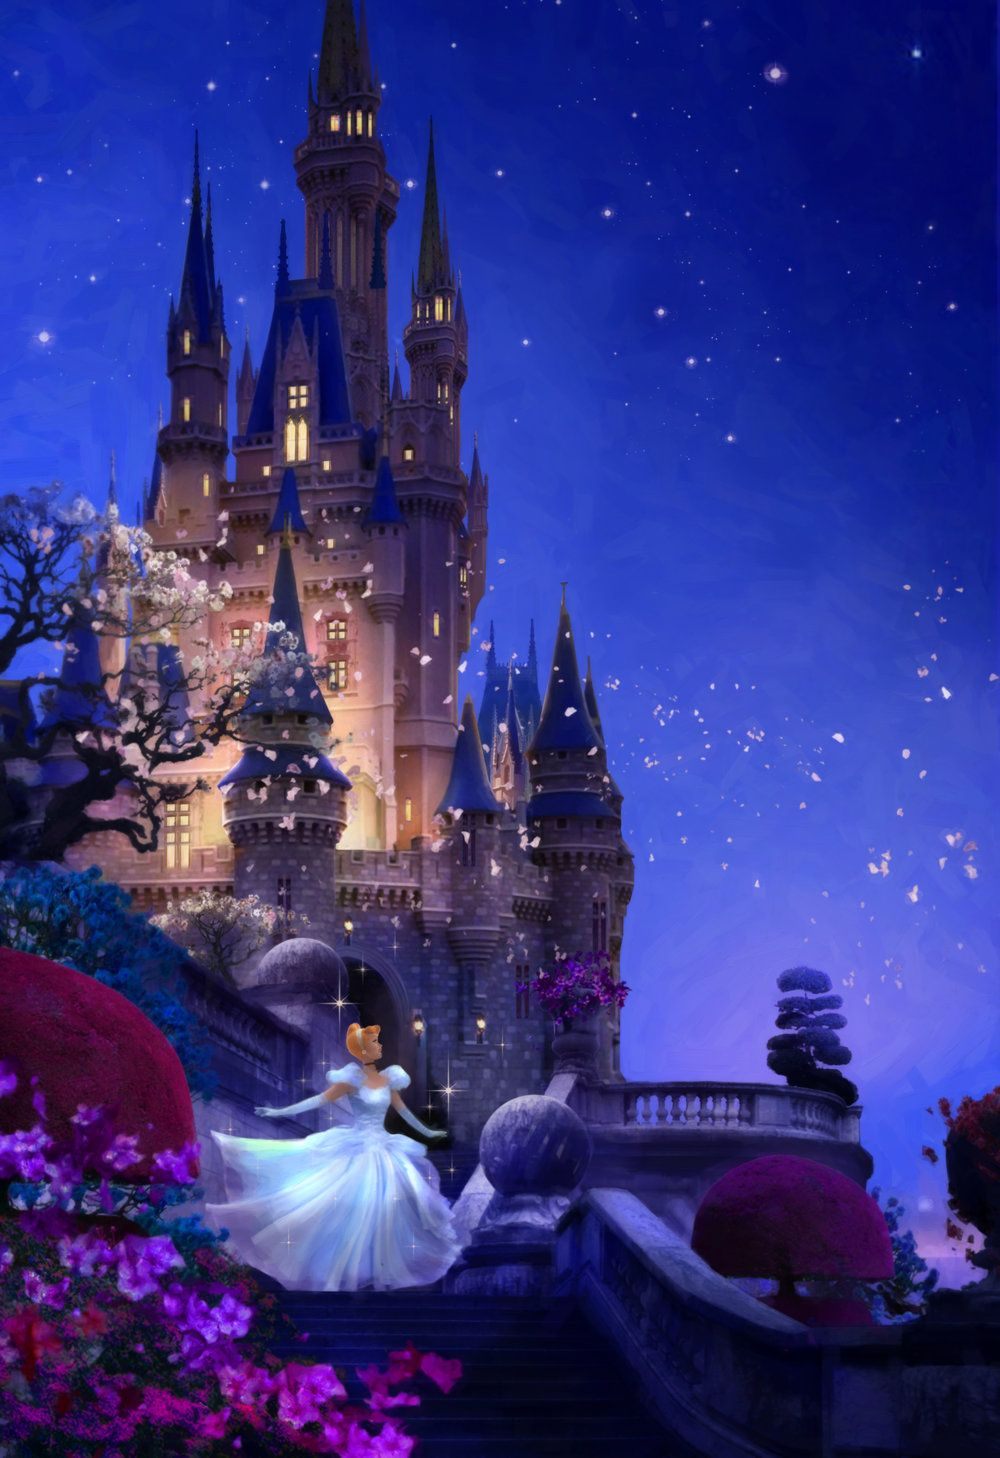 Wallpaper Iphone Disney Princess Disney Princess Cinderella Wallpaper Iphone Disney